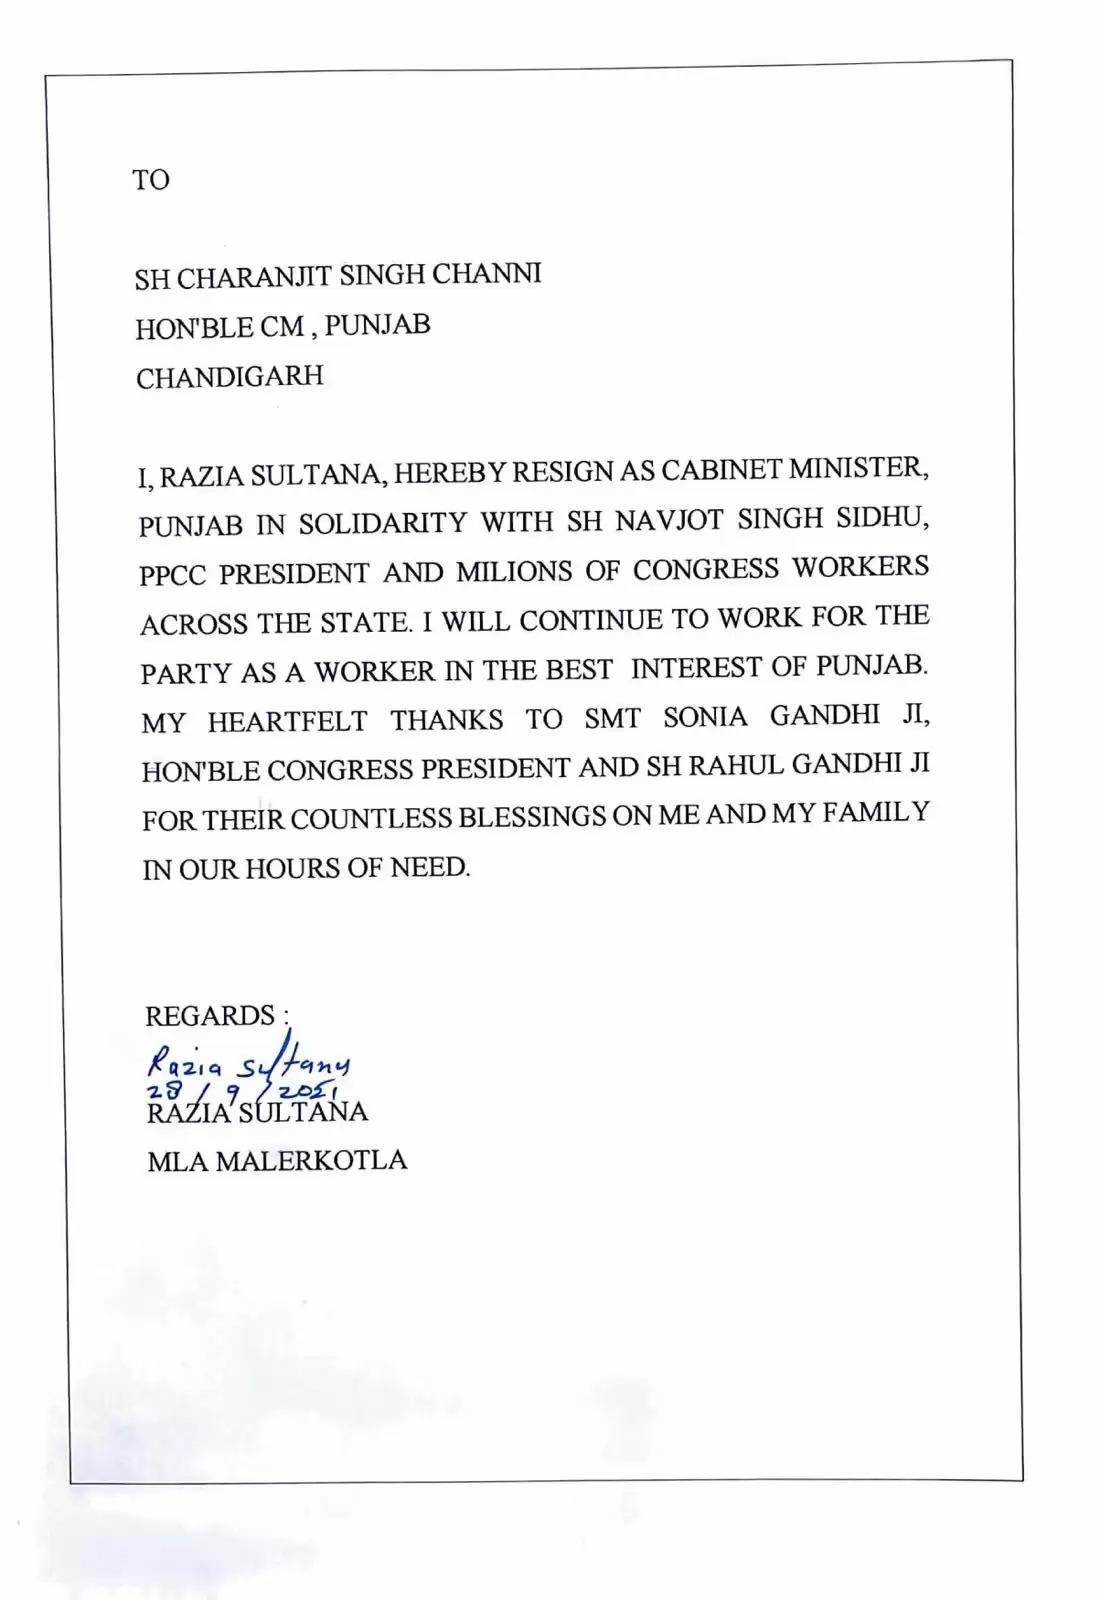 Razia-Sultana-resign